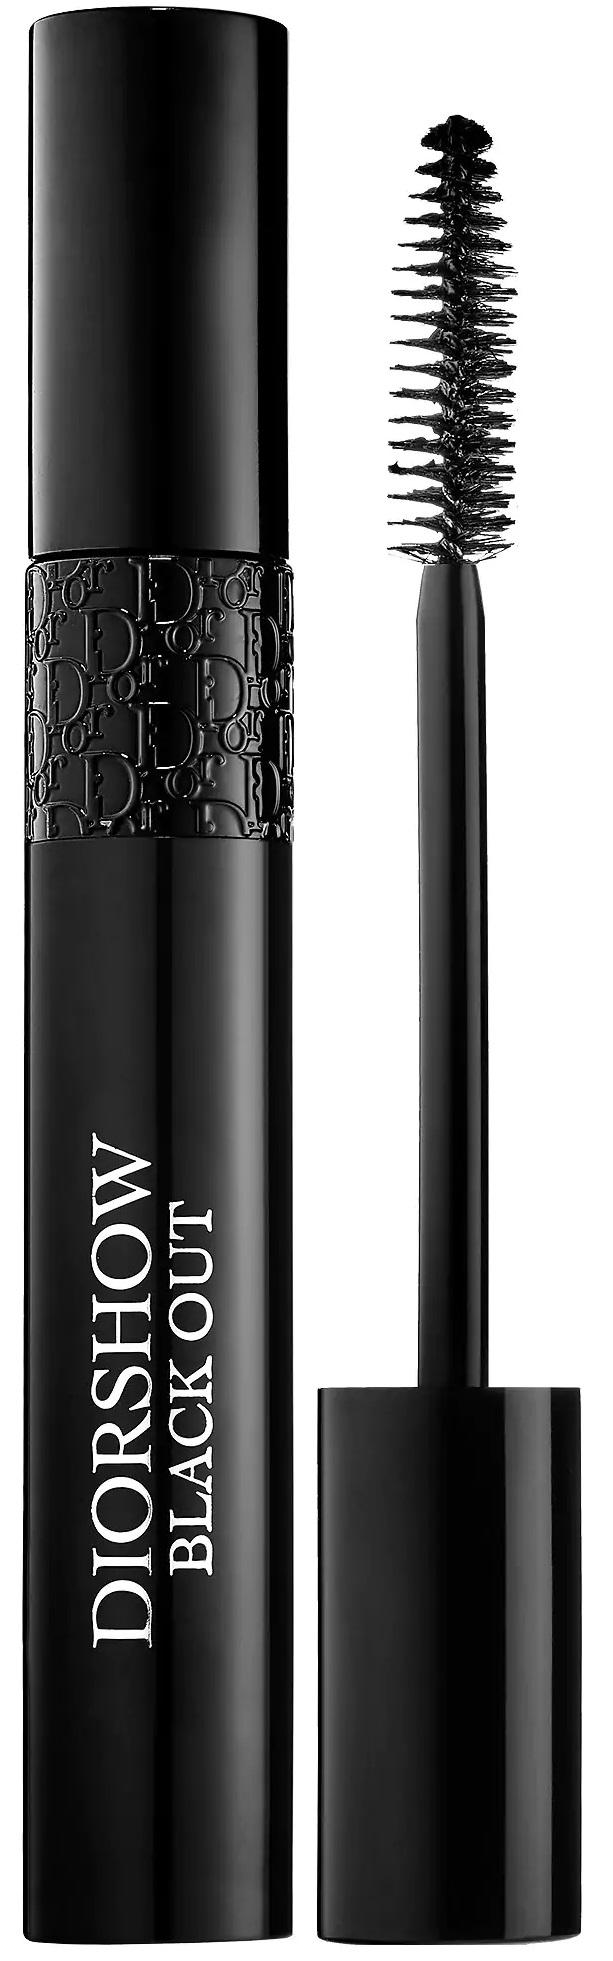 Dior Diorshow Black Out 10ml - 099 Khol Black